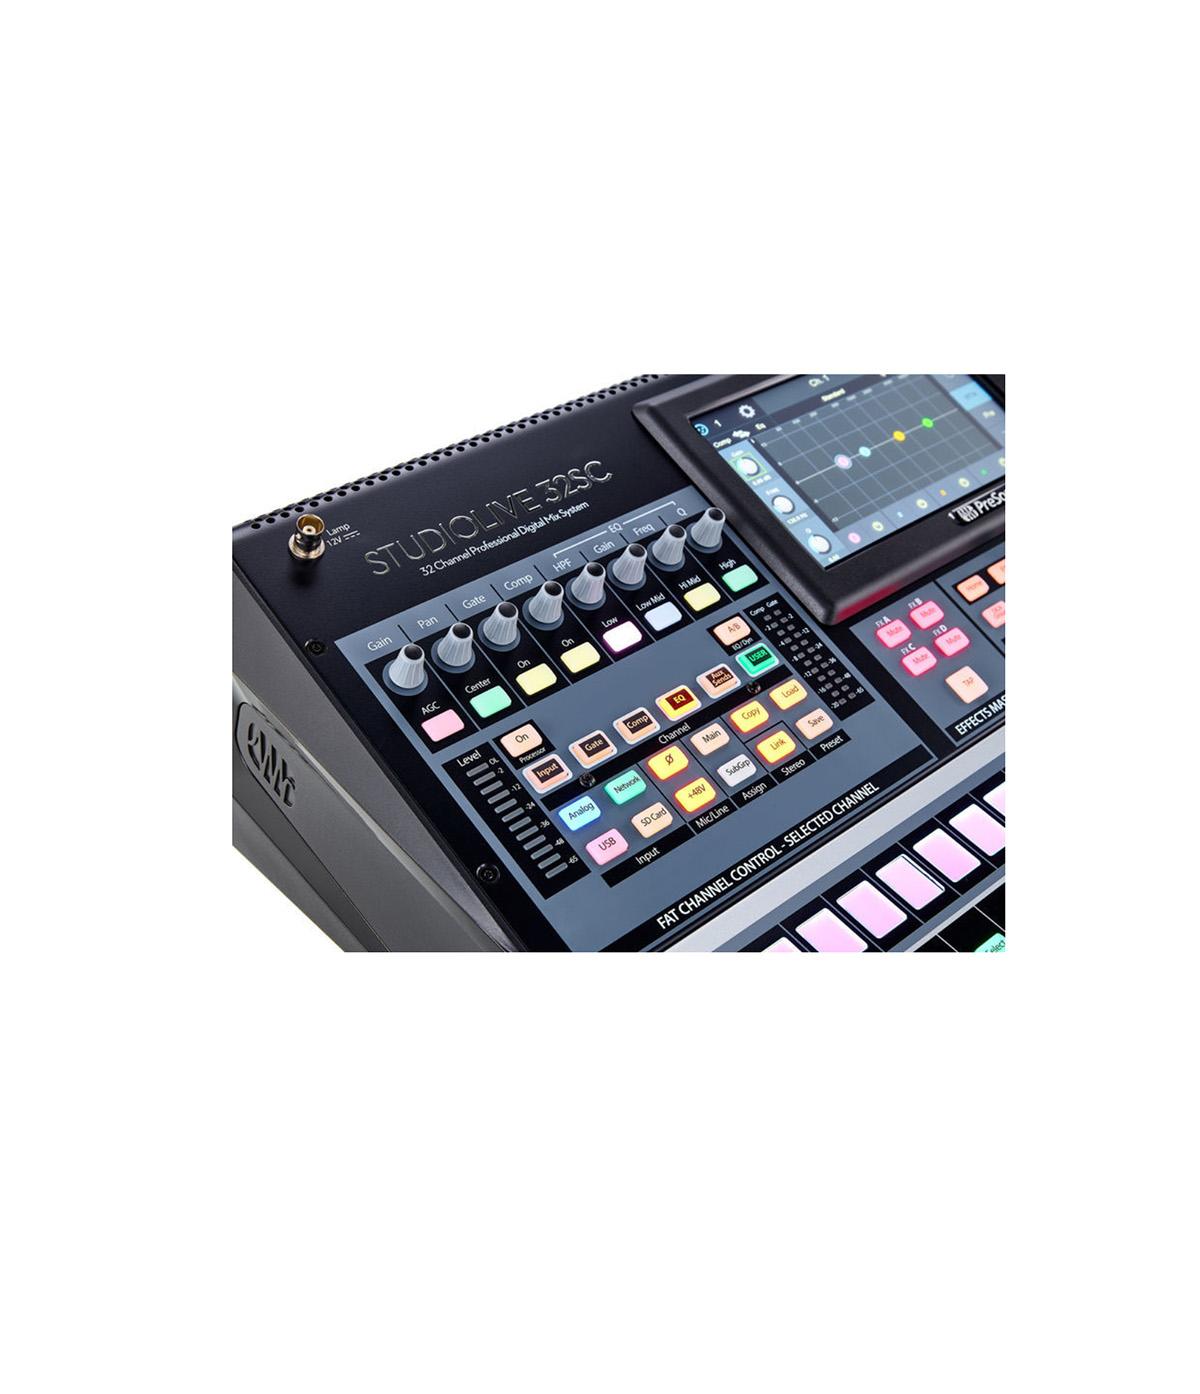 MÍXER DIGITAL PRESONUS STUDIOLIVE 32SC SERIES III